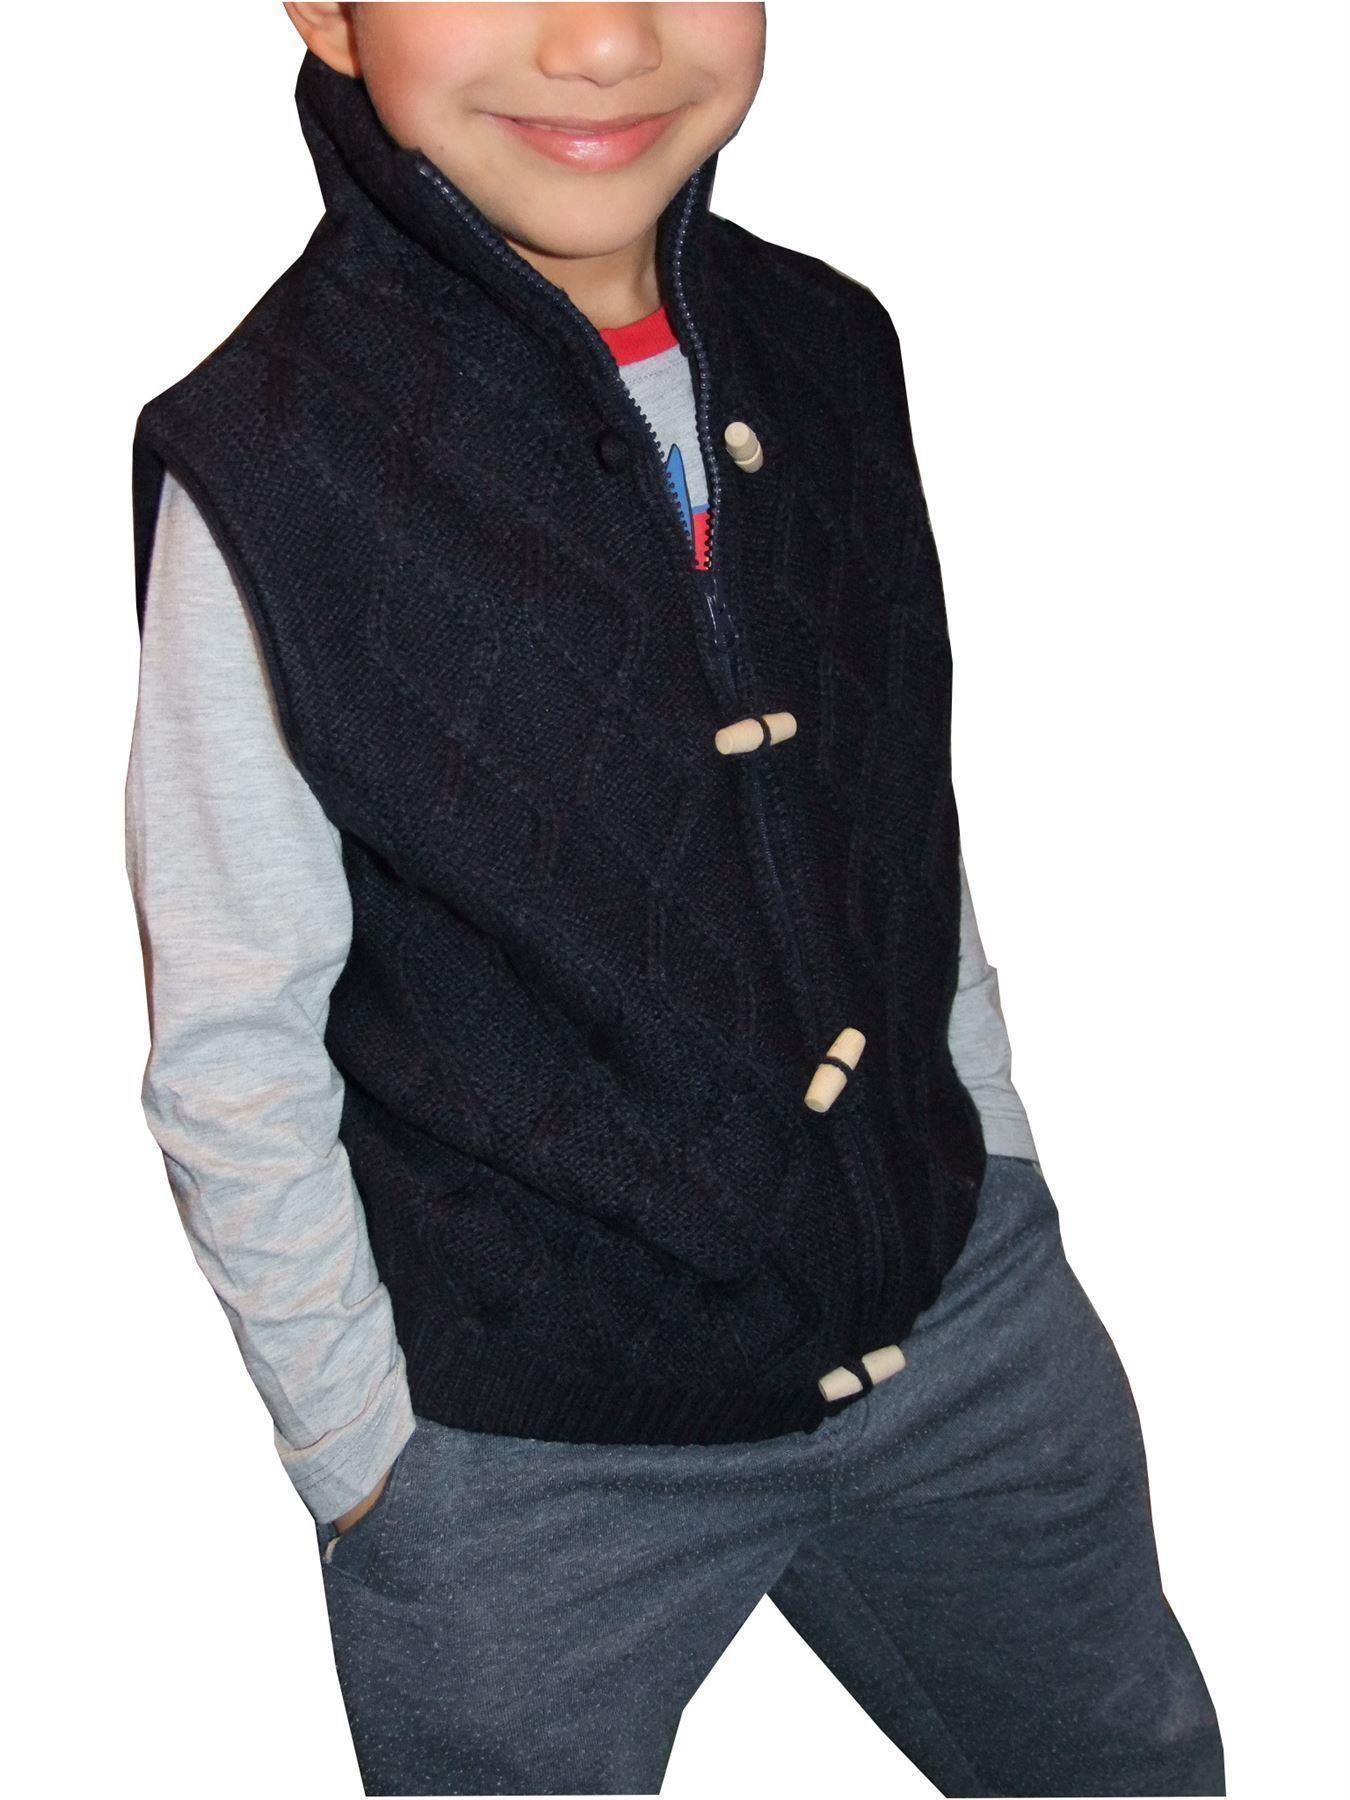 Boys Okaidi Fine Knit V Neck Jumper Cotton Navy Age 3 to 14 Years Kids